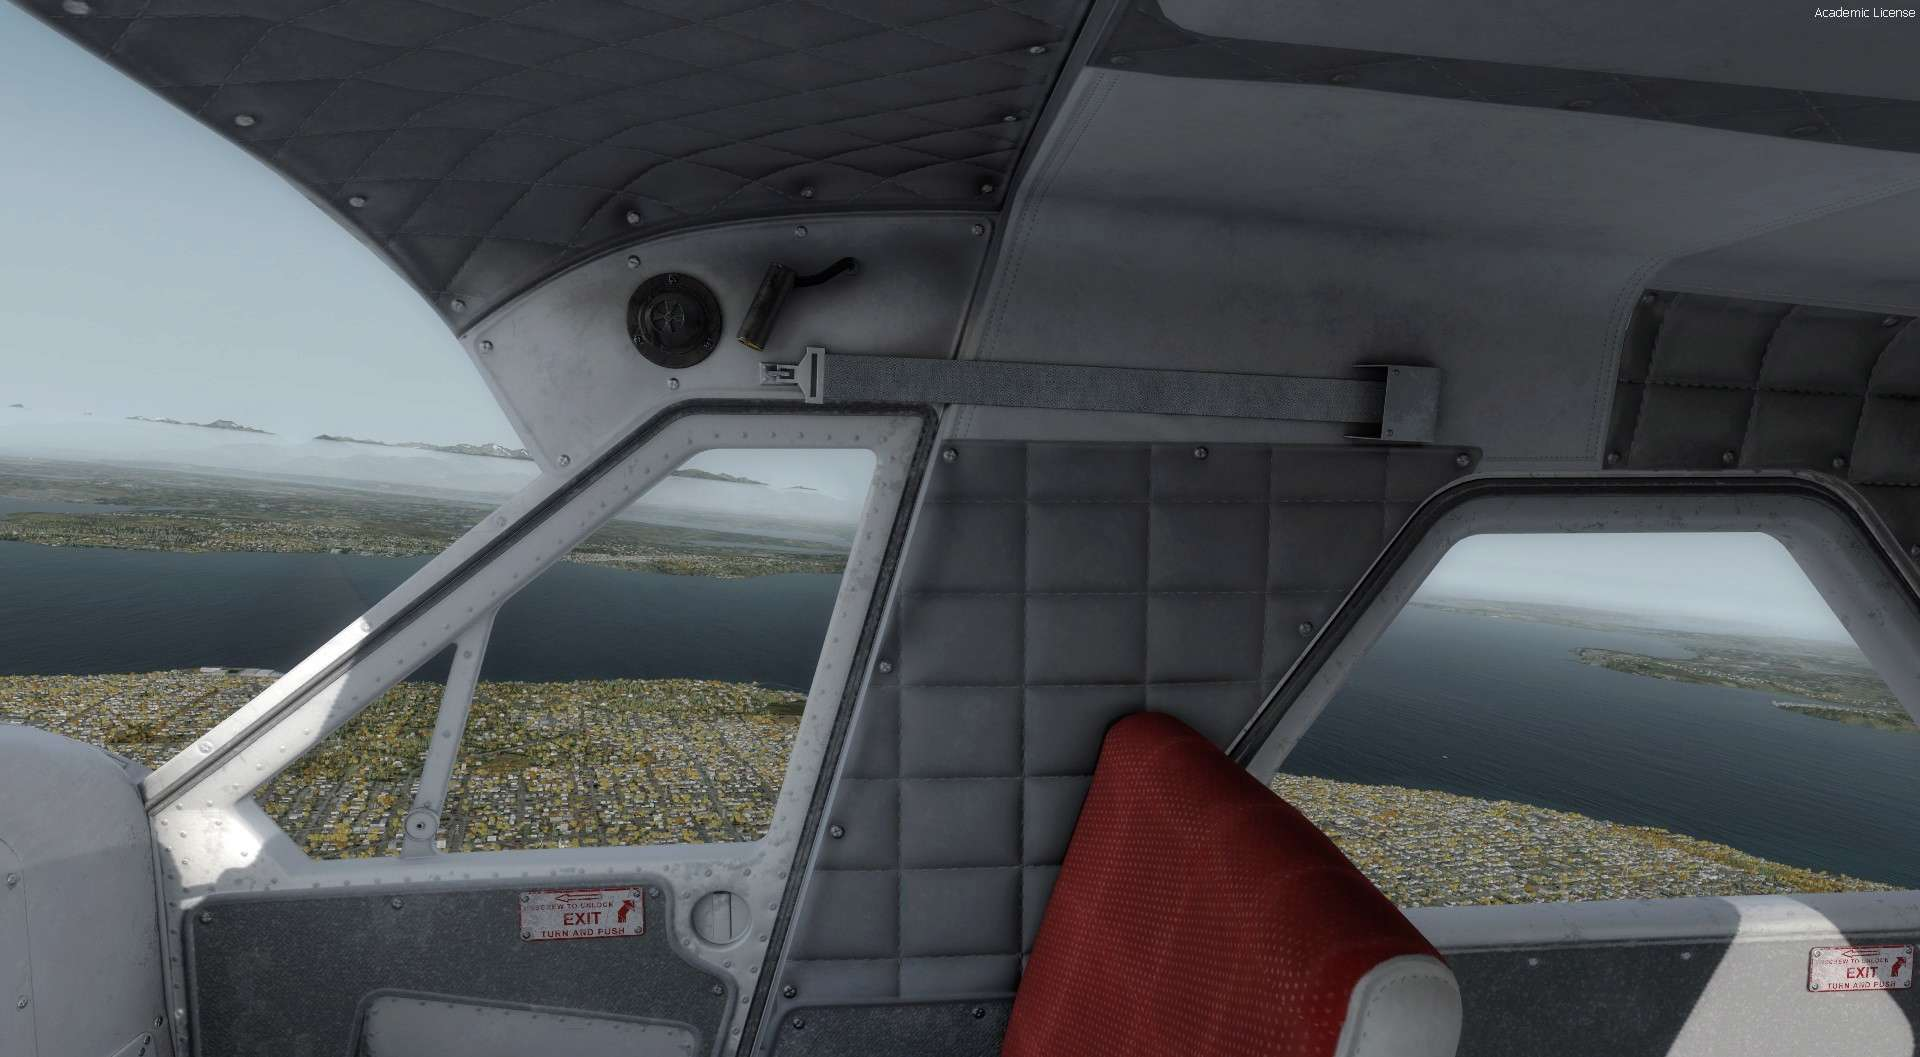 Compte rendu du vol Kenmore Air Harbor (W55) à Kenmore Air Harbor (W55) 2017-120